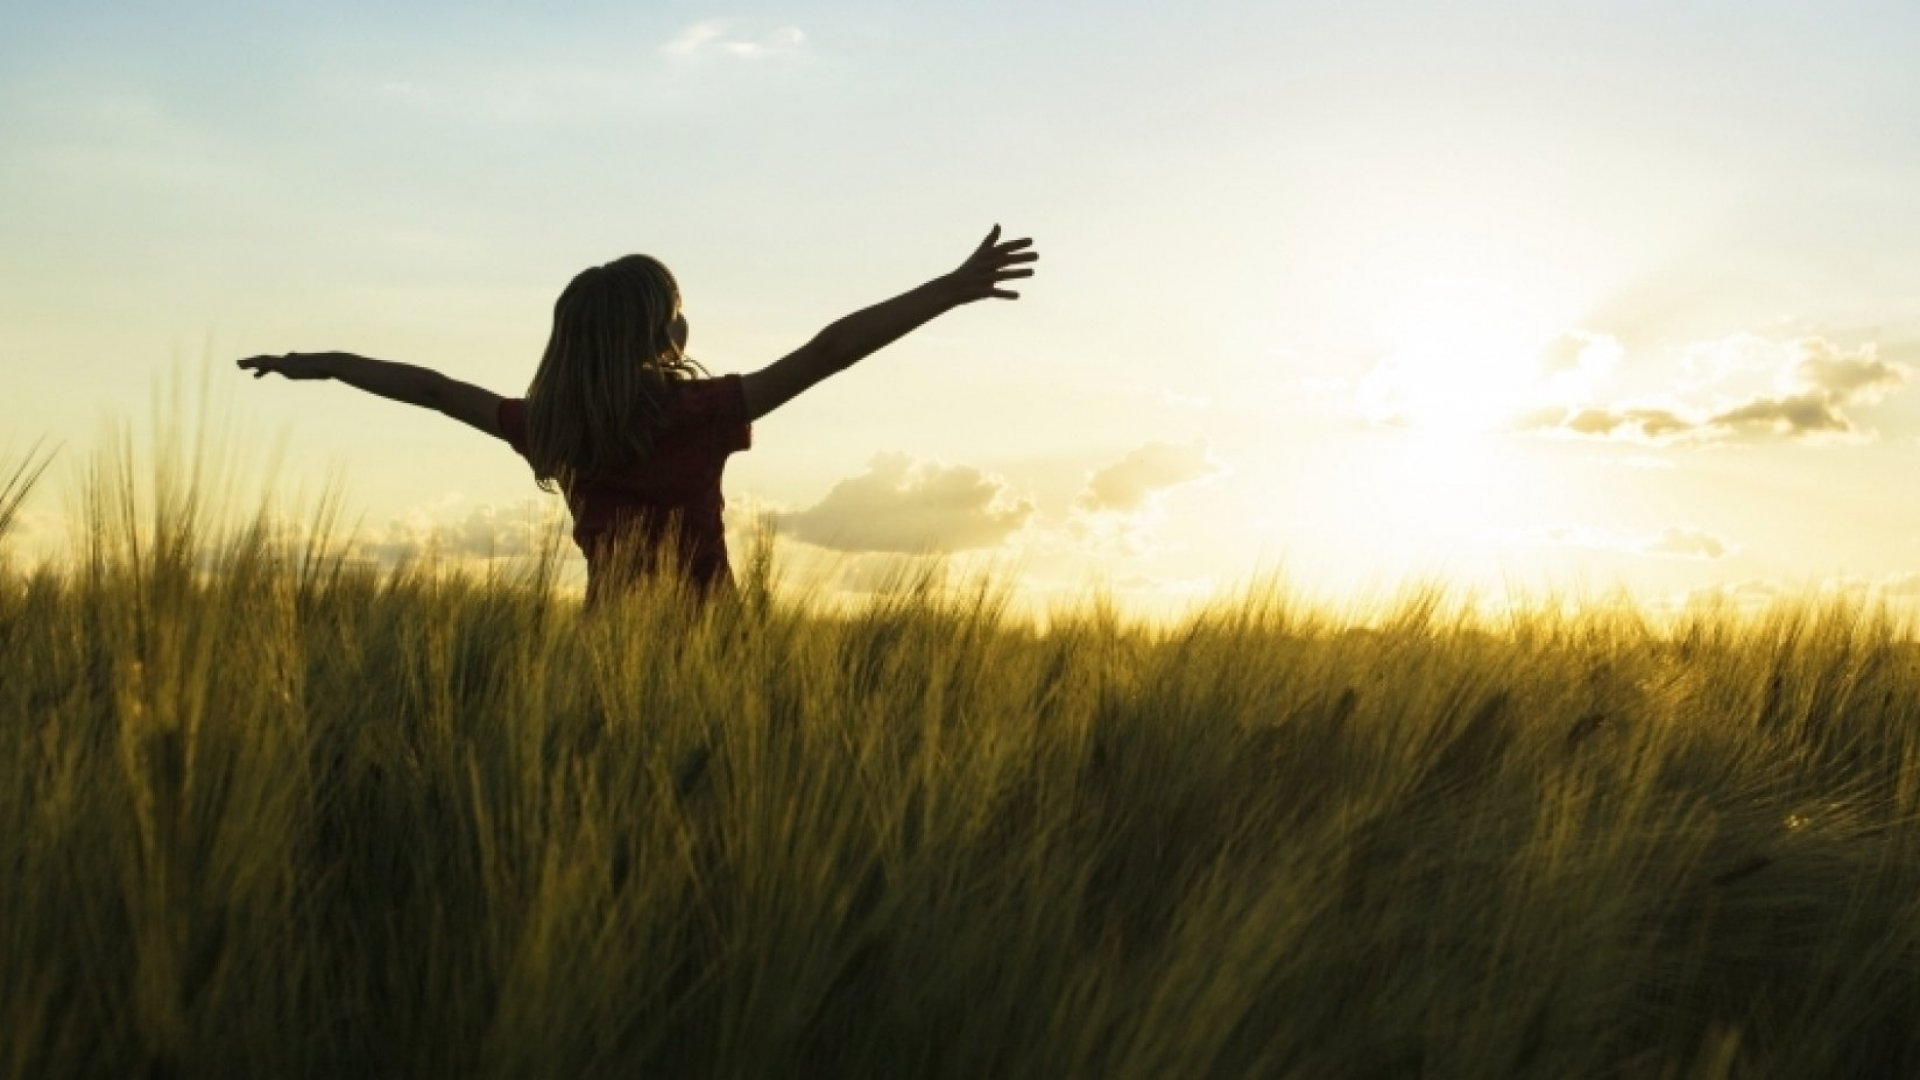 5 Life-Changing Habits That Melt Toxic Attitudes